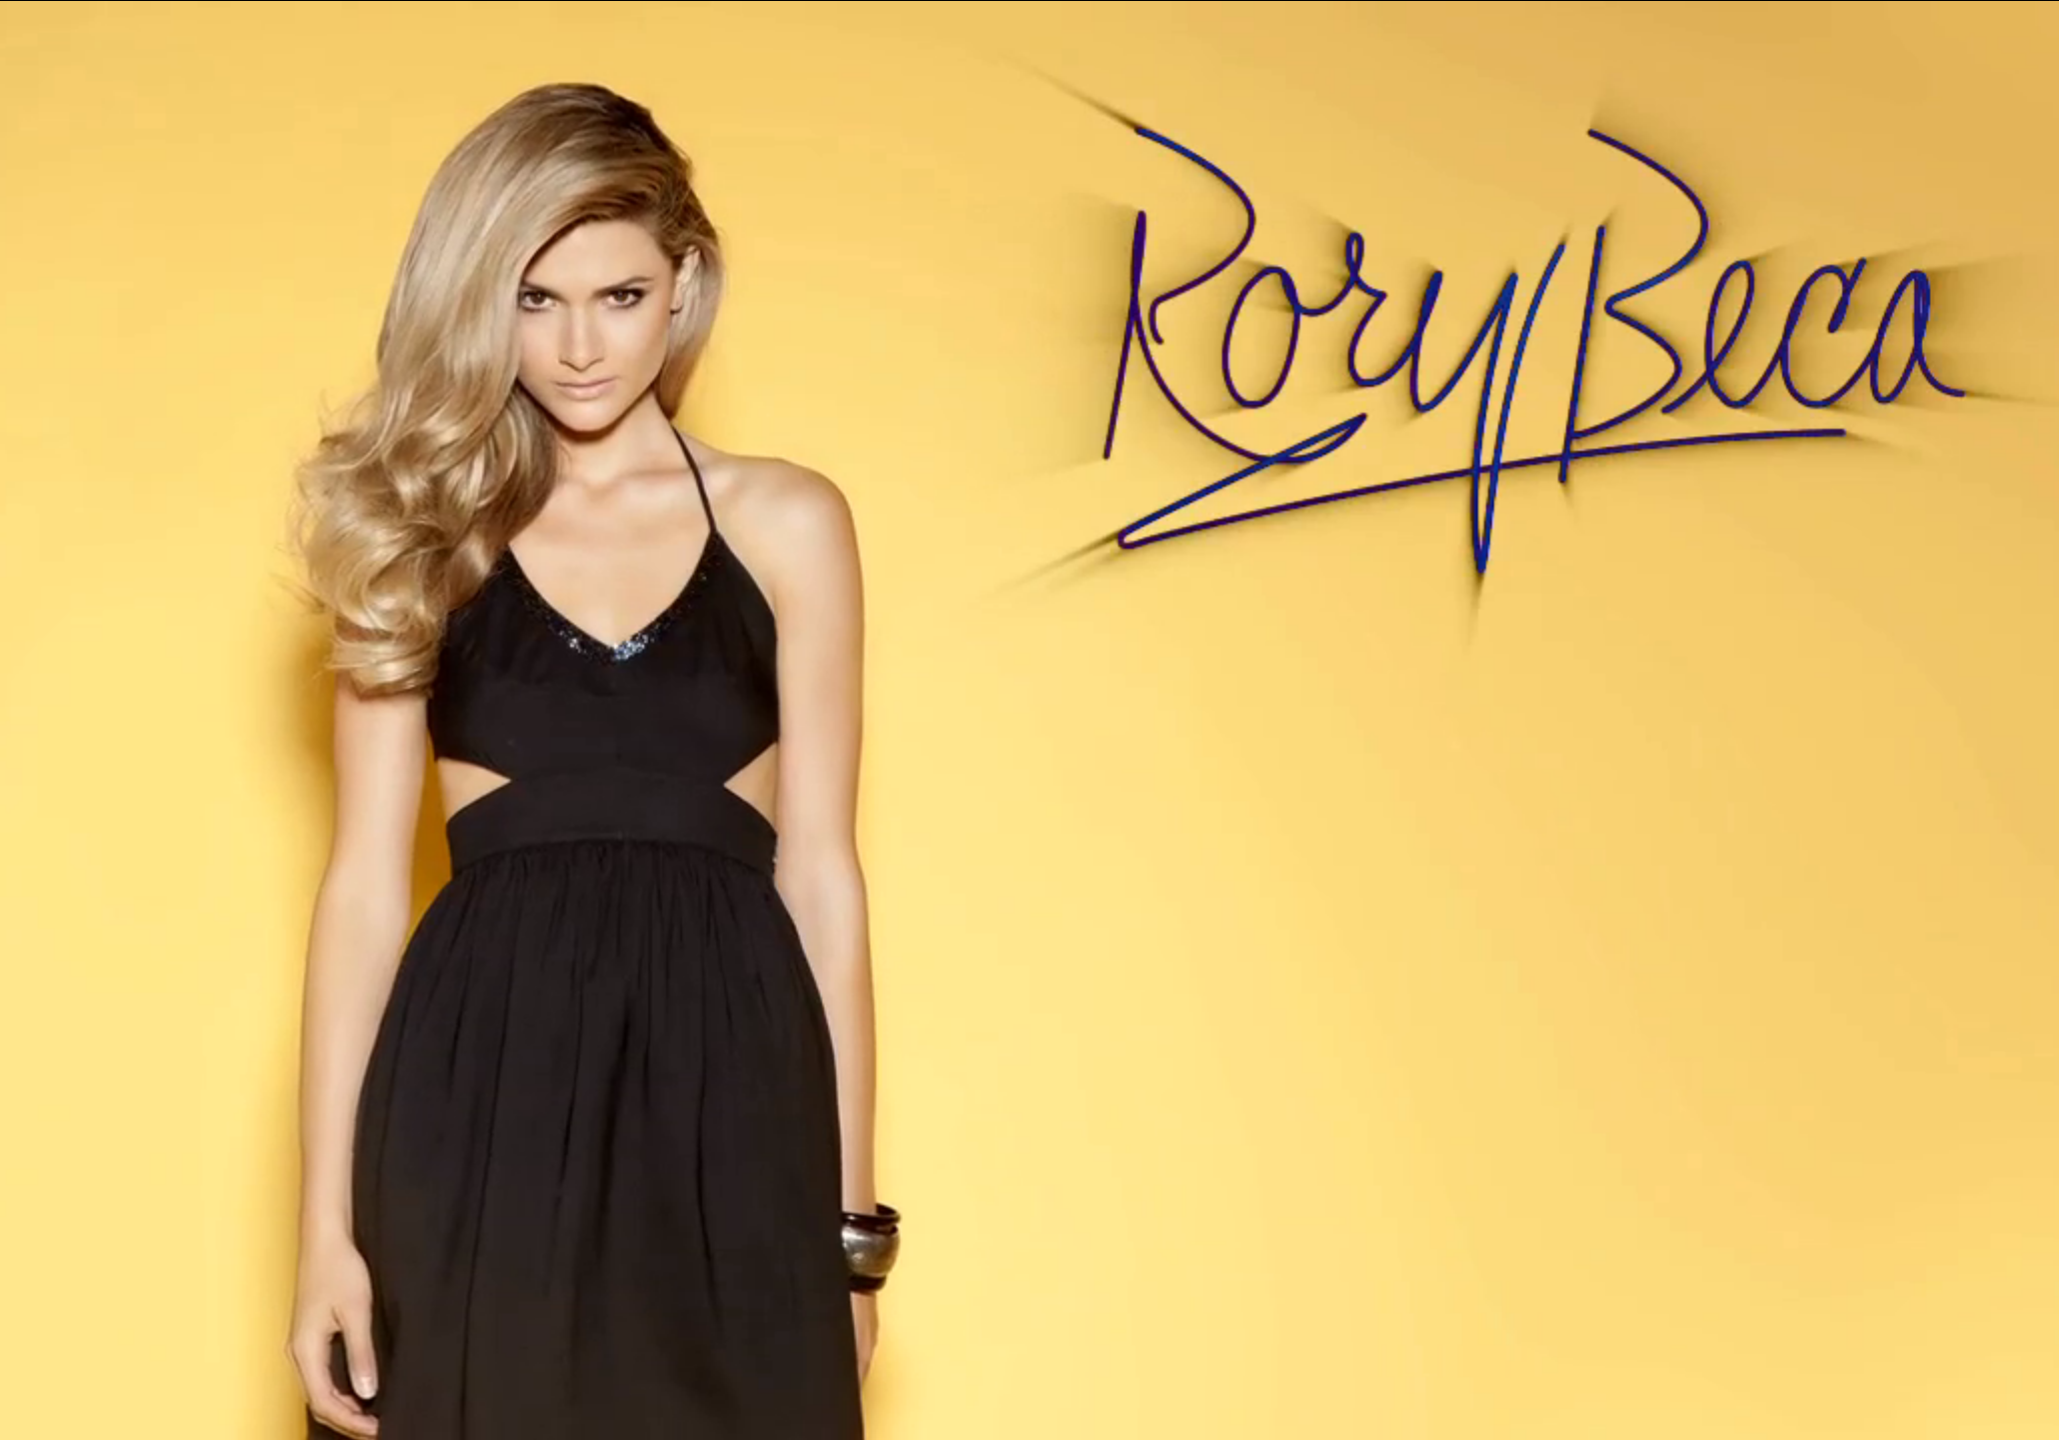 Forever 21 - Rory Beca Design